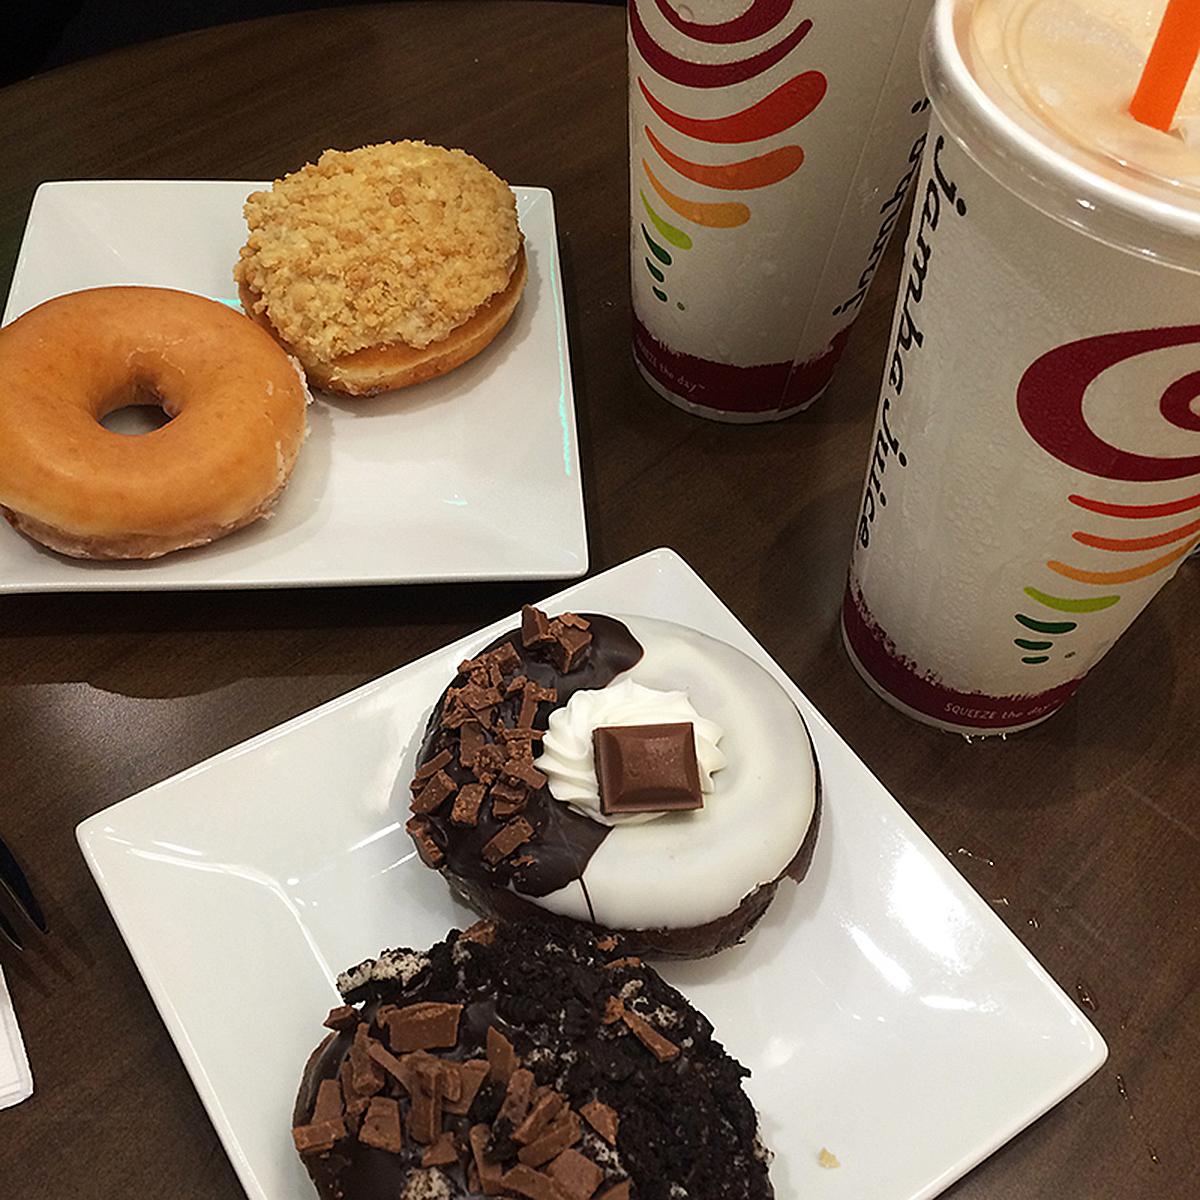 Trice Nagusara Krispy Kreme and Jamba Juice 02